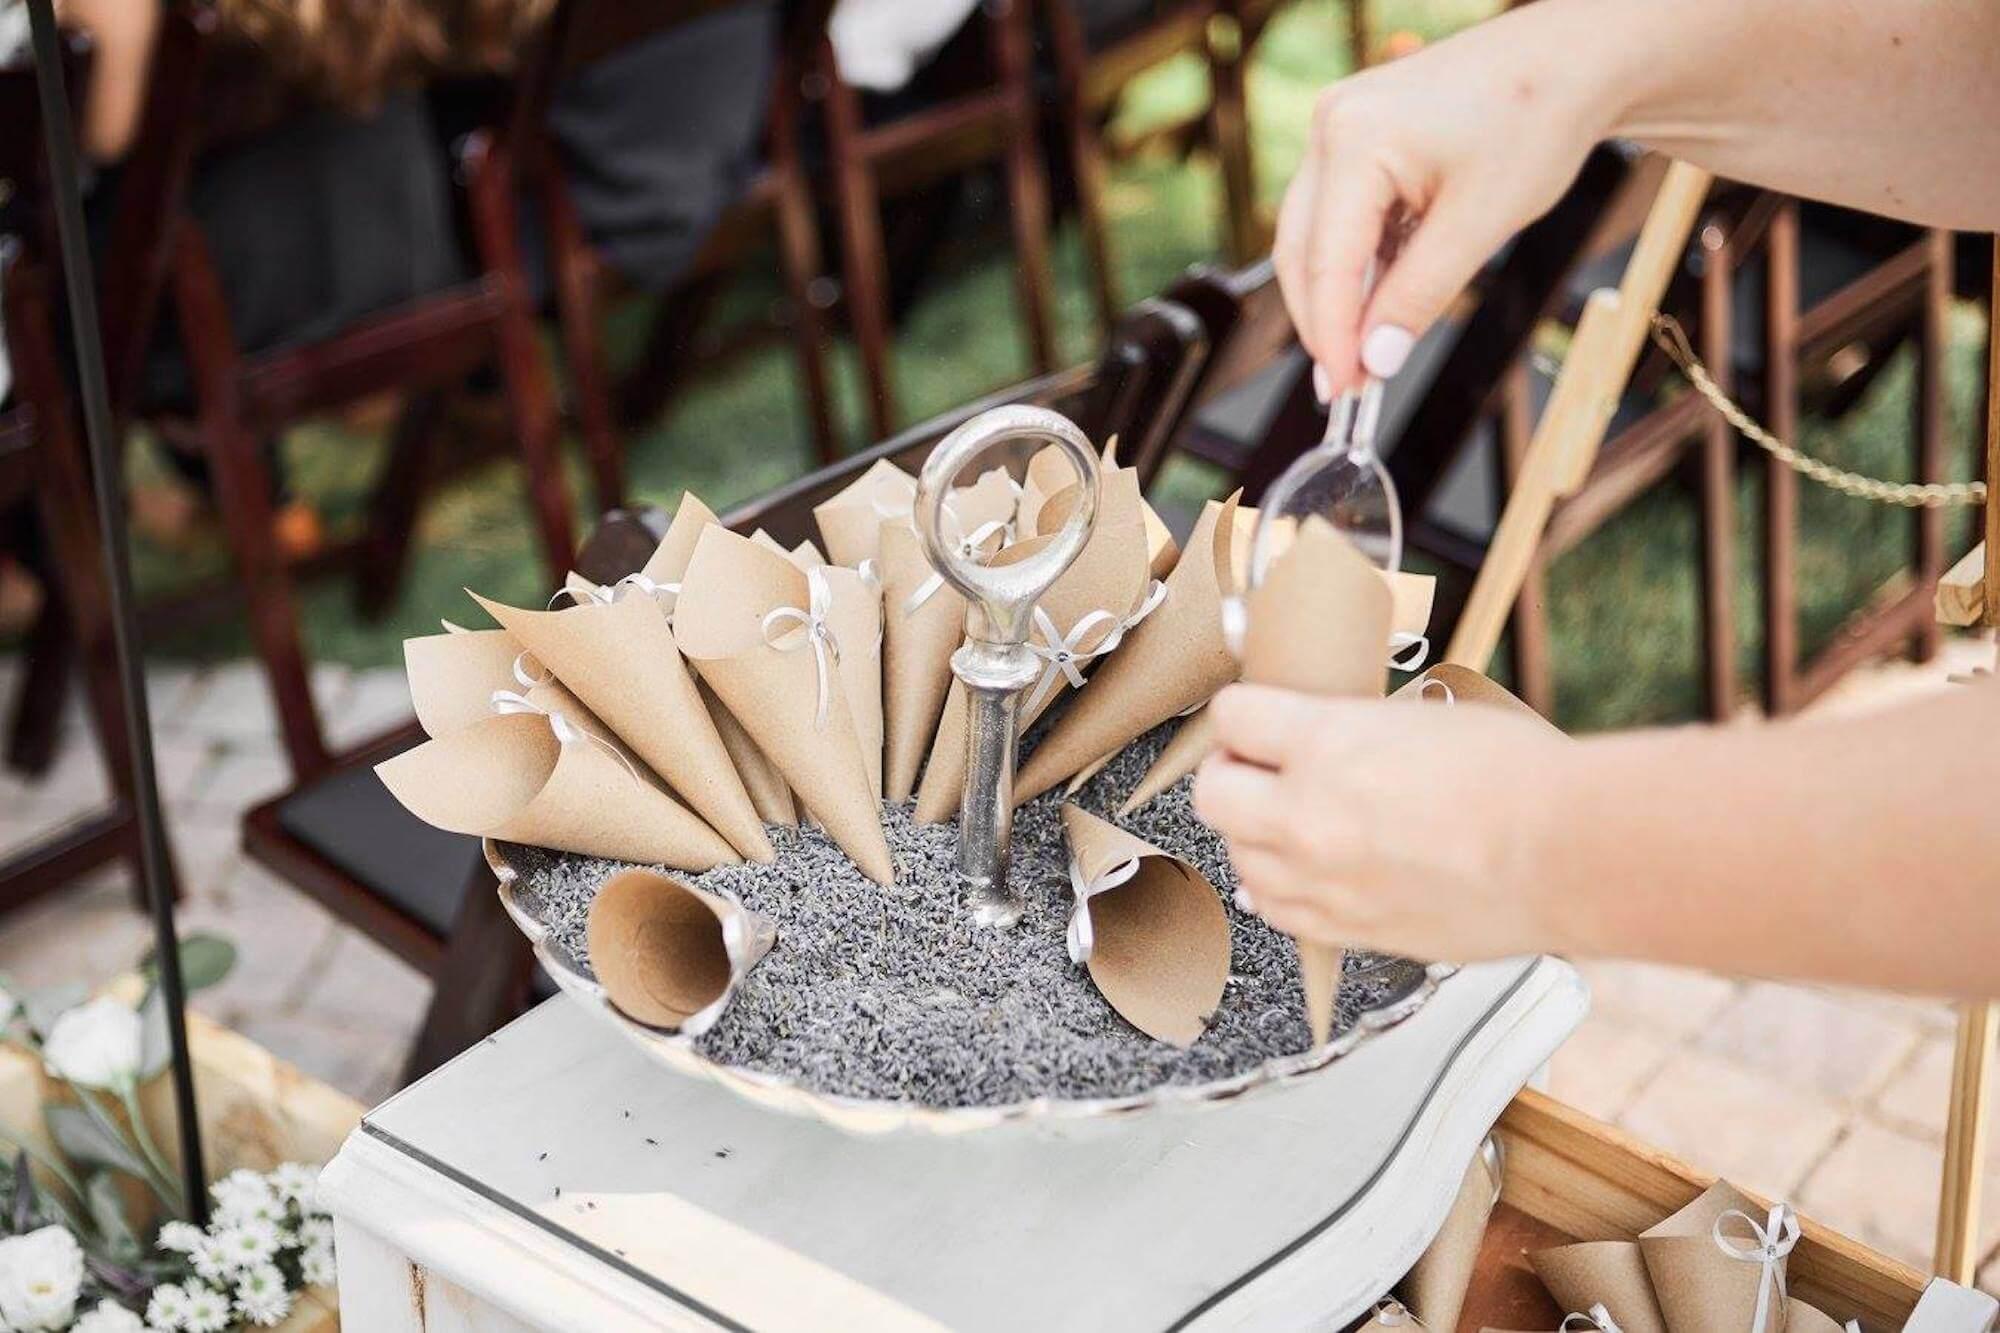 engle-olson-wedding-video-perry-james-photography-27.jpg